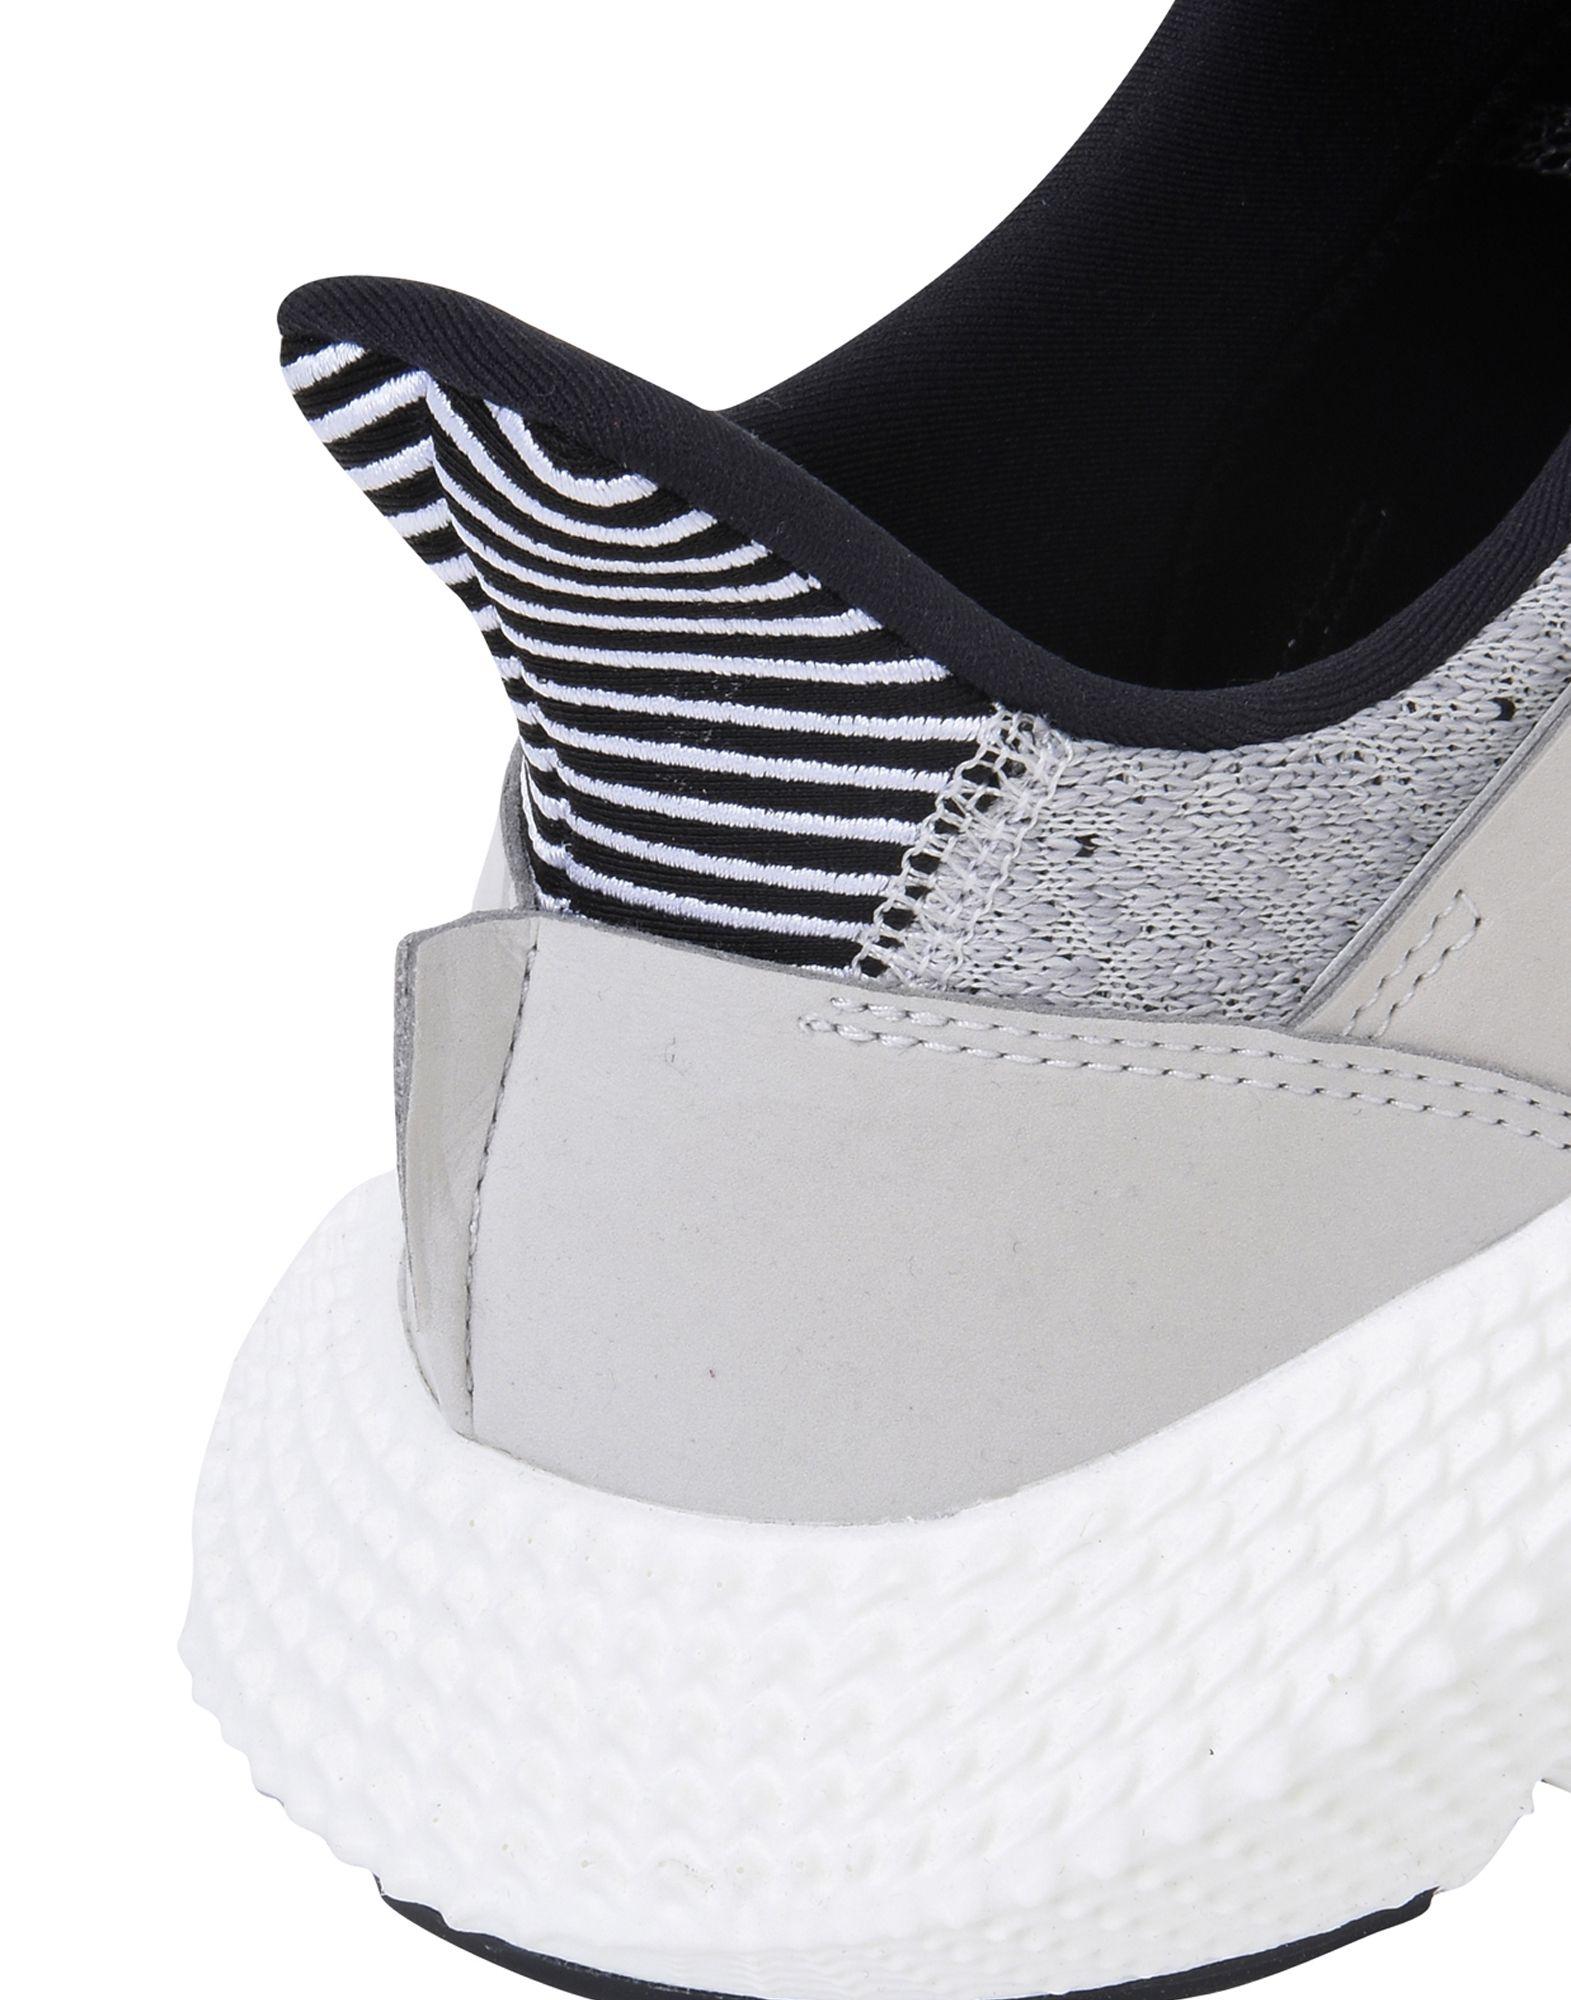 11533548JA Adidas Originals Prophere  11533548JA  Heiße Schuhe 221c02